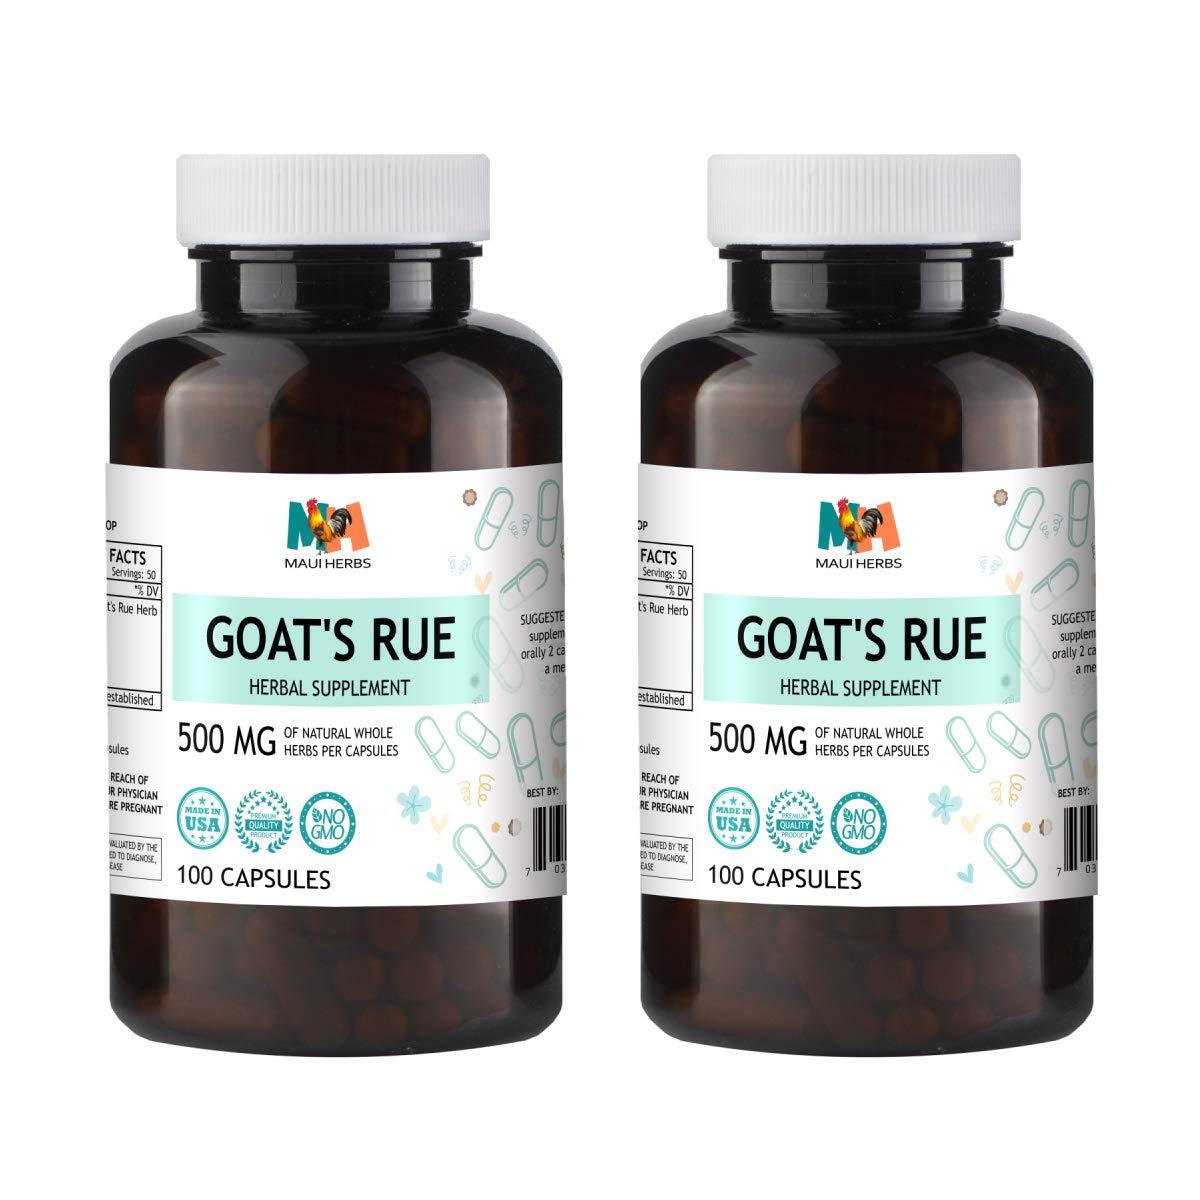 Goat's Rue Capsules, 500 mg, Organic Goat's Rue Herb (Galega officinalis) (2x100 Capsules)